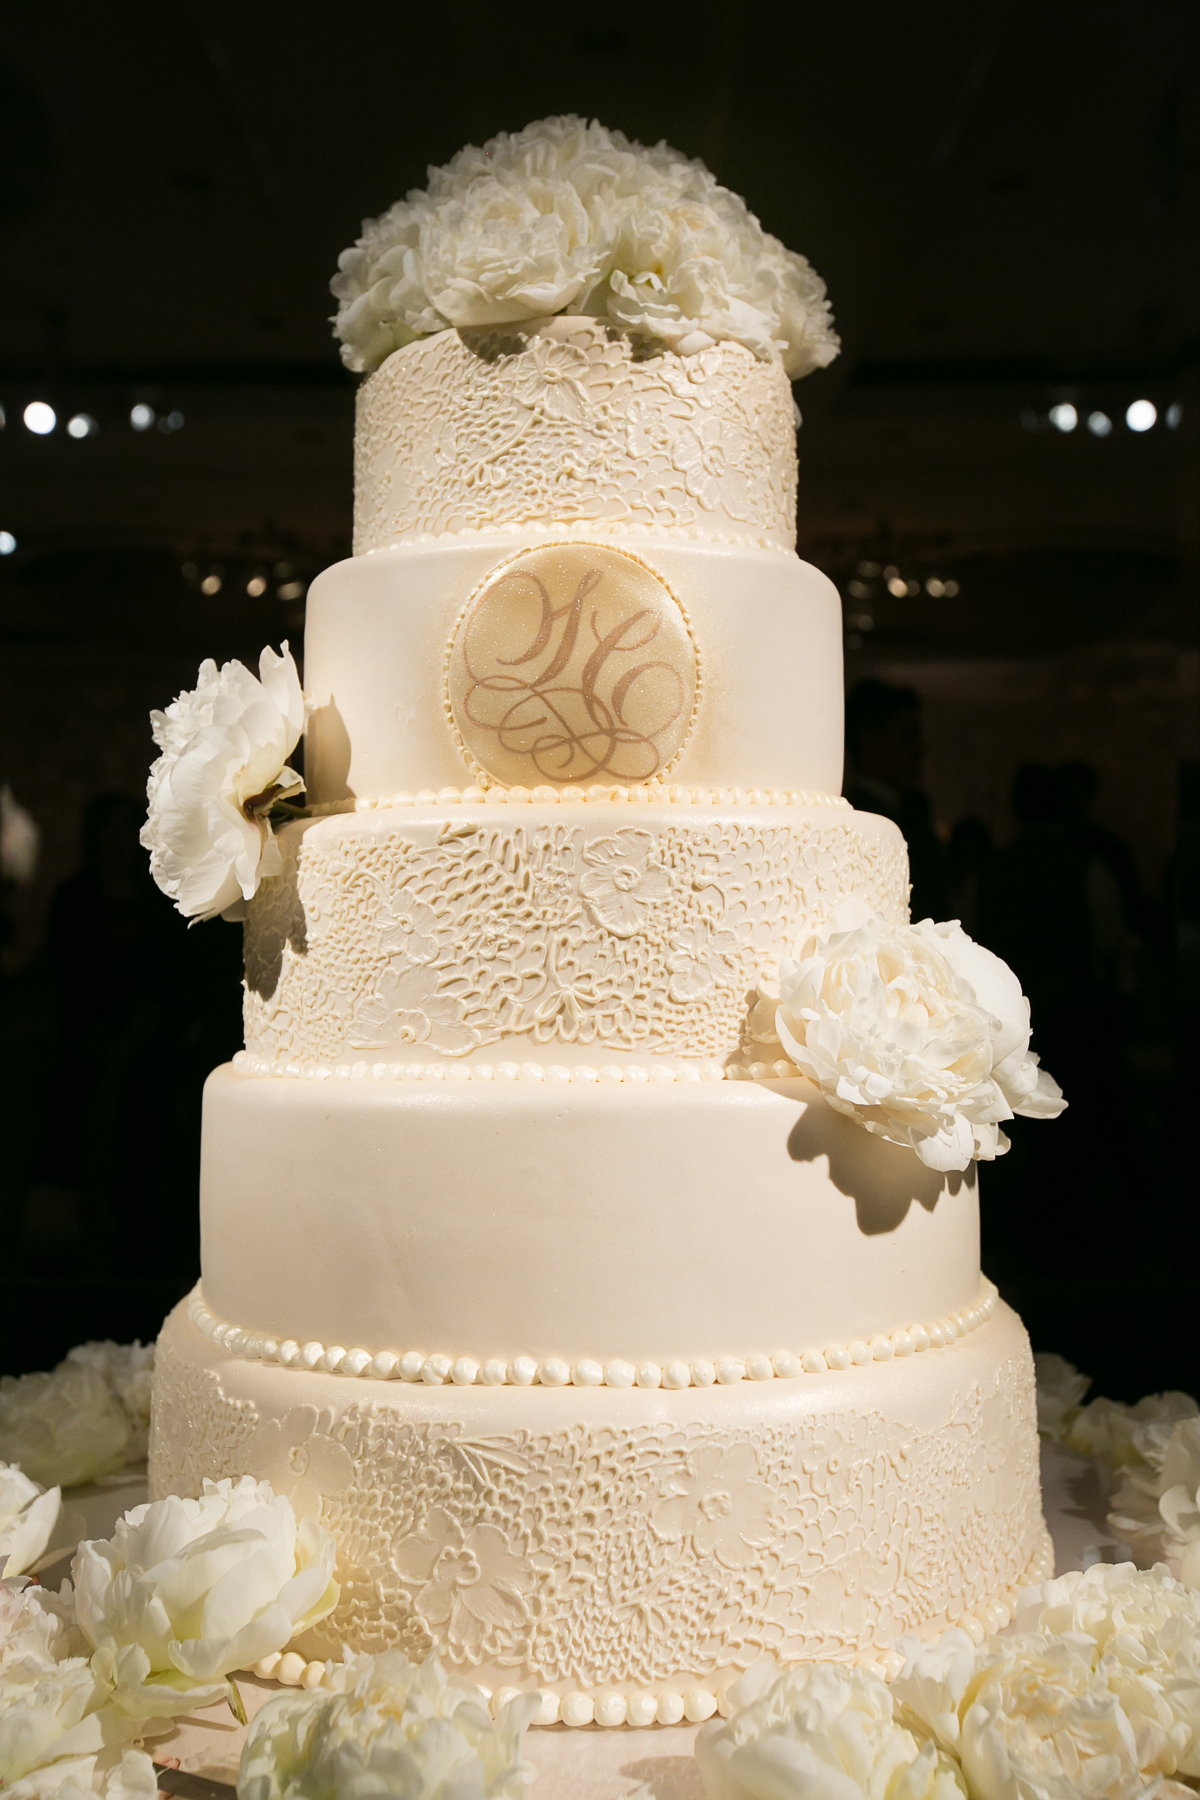 White wedding cake with lace details, monogram, and fresh peony flowers